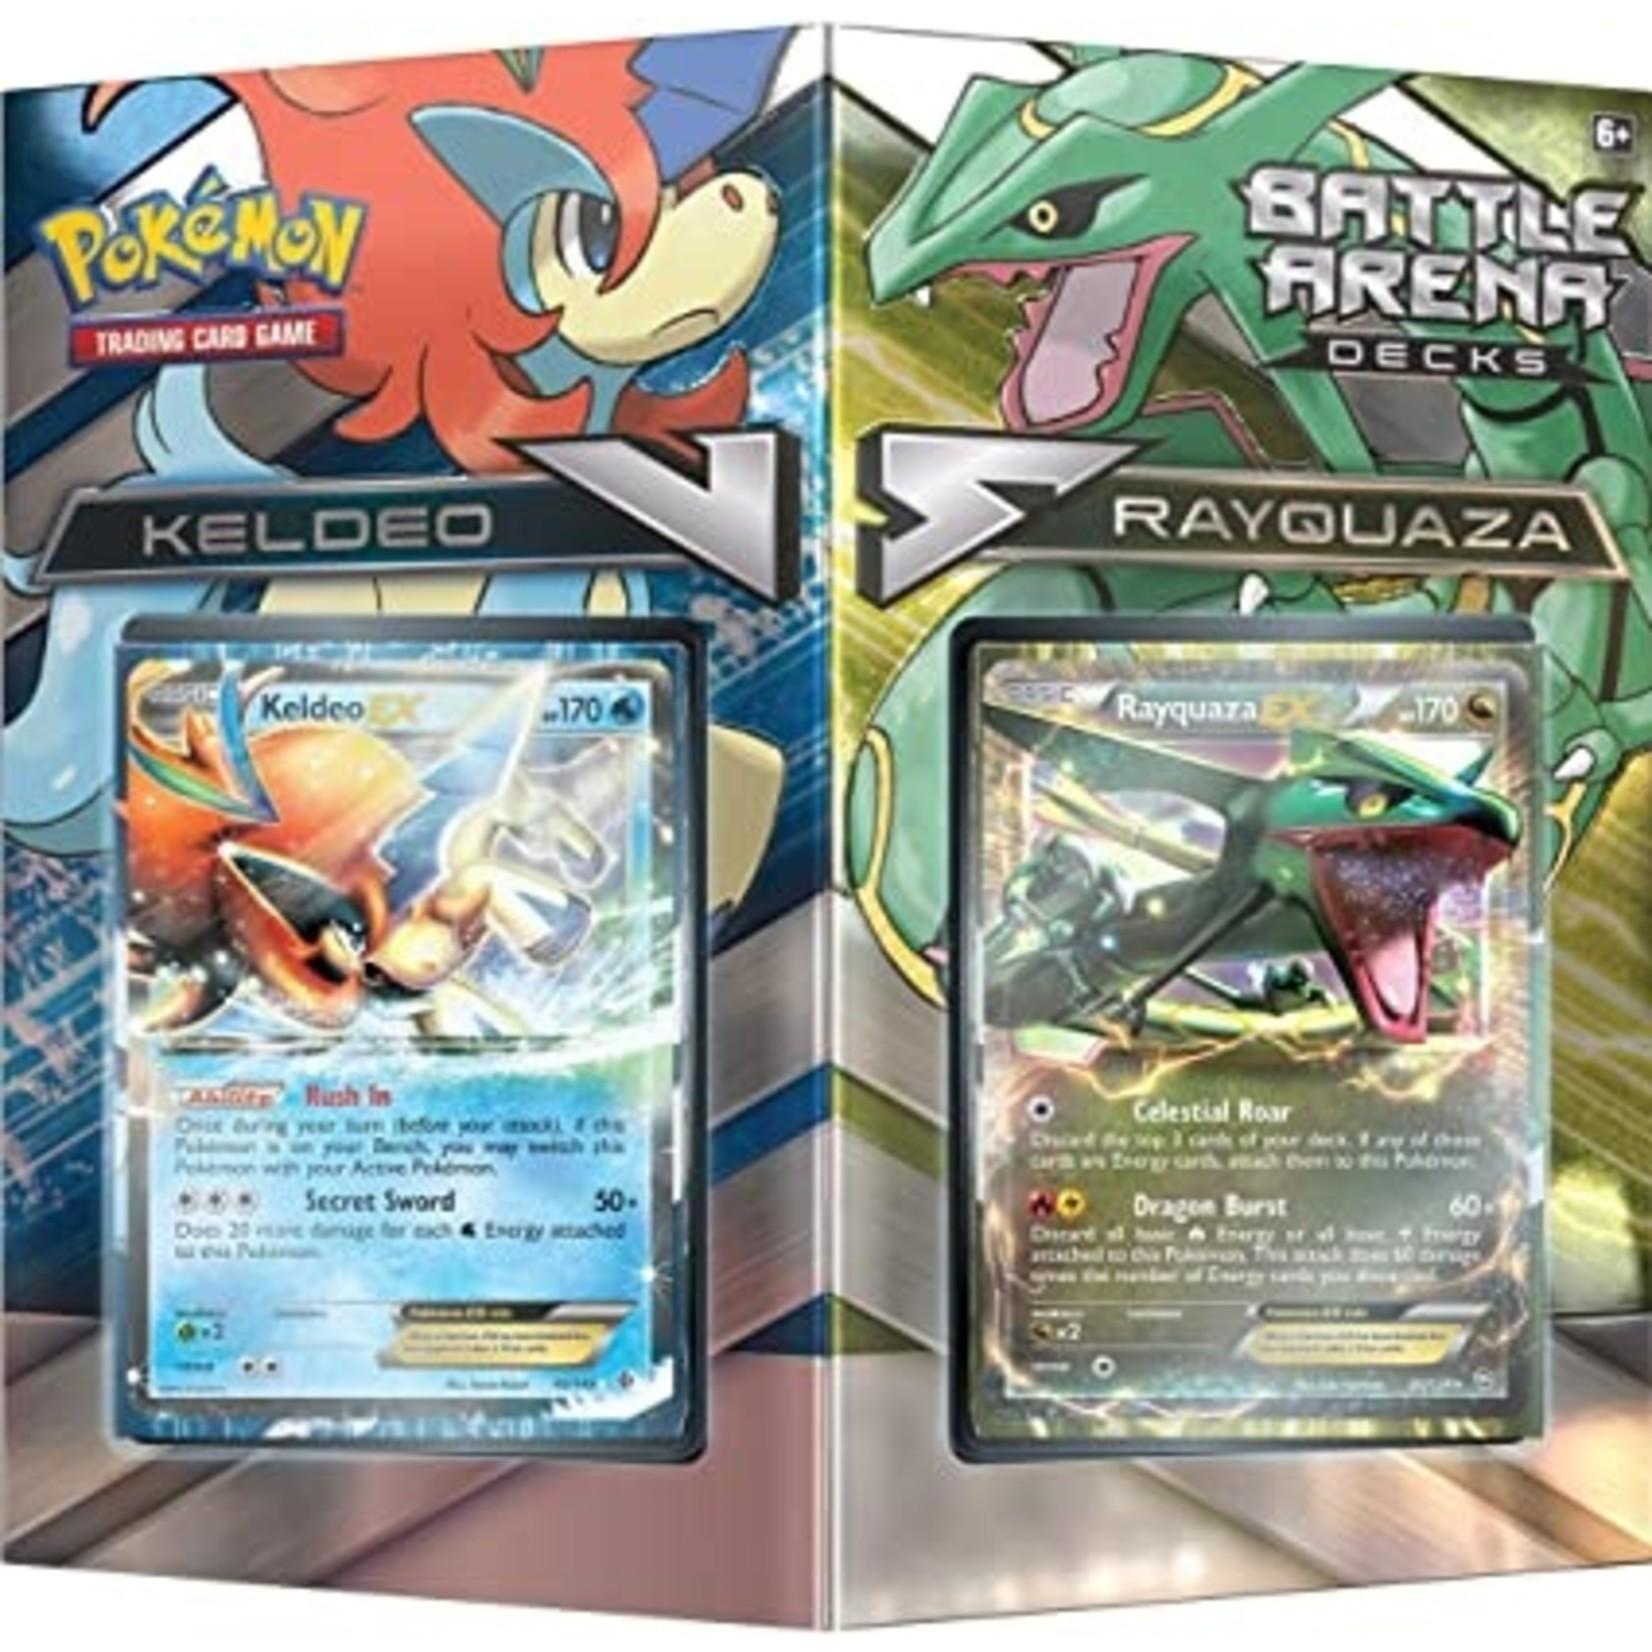 Rayquaza vs Keldo Battle Arena Deck